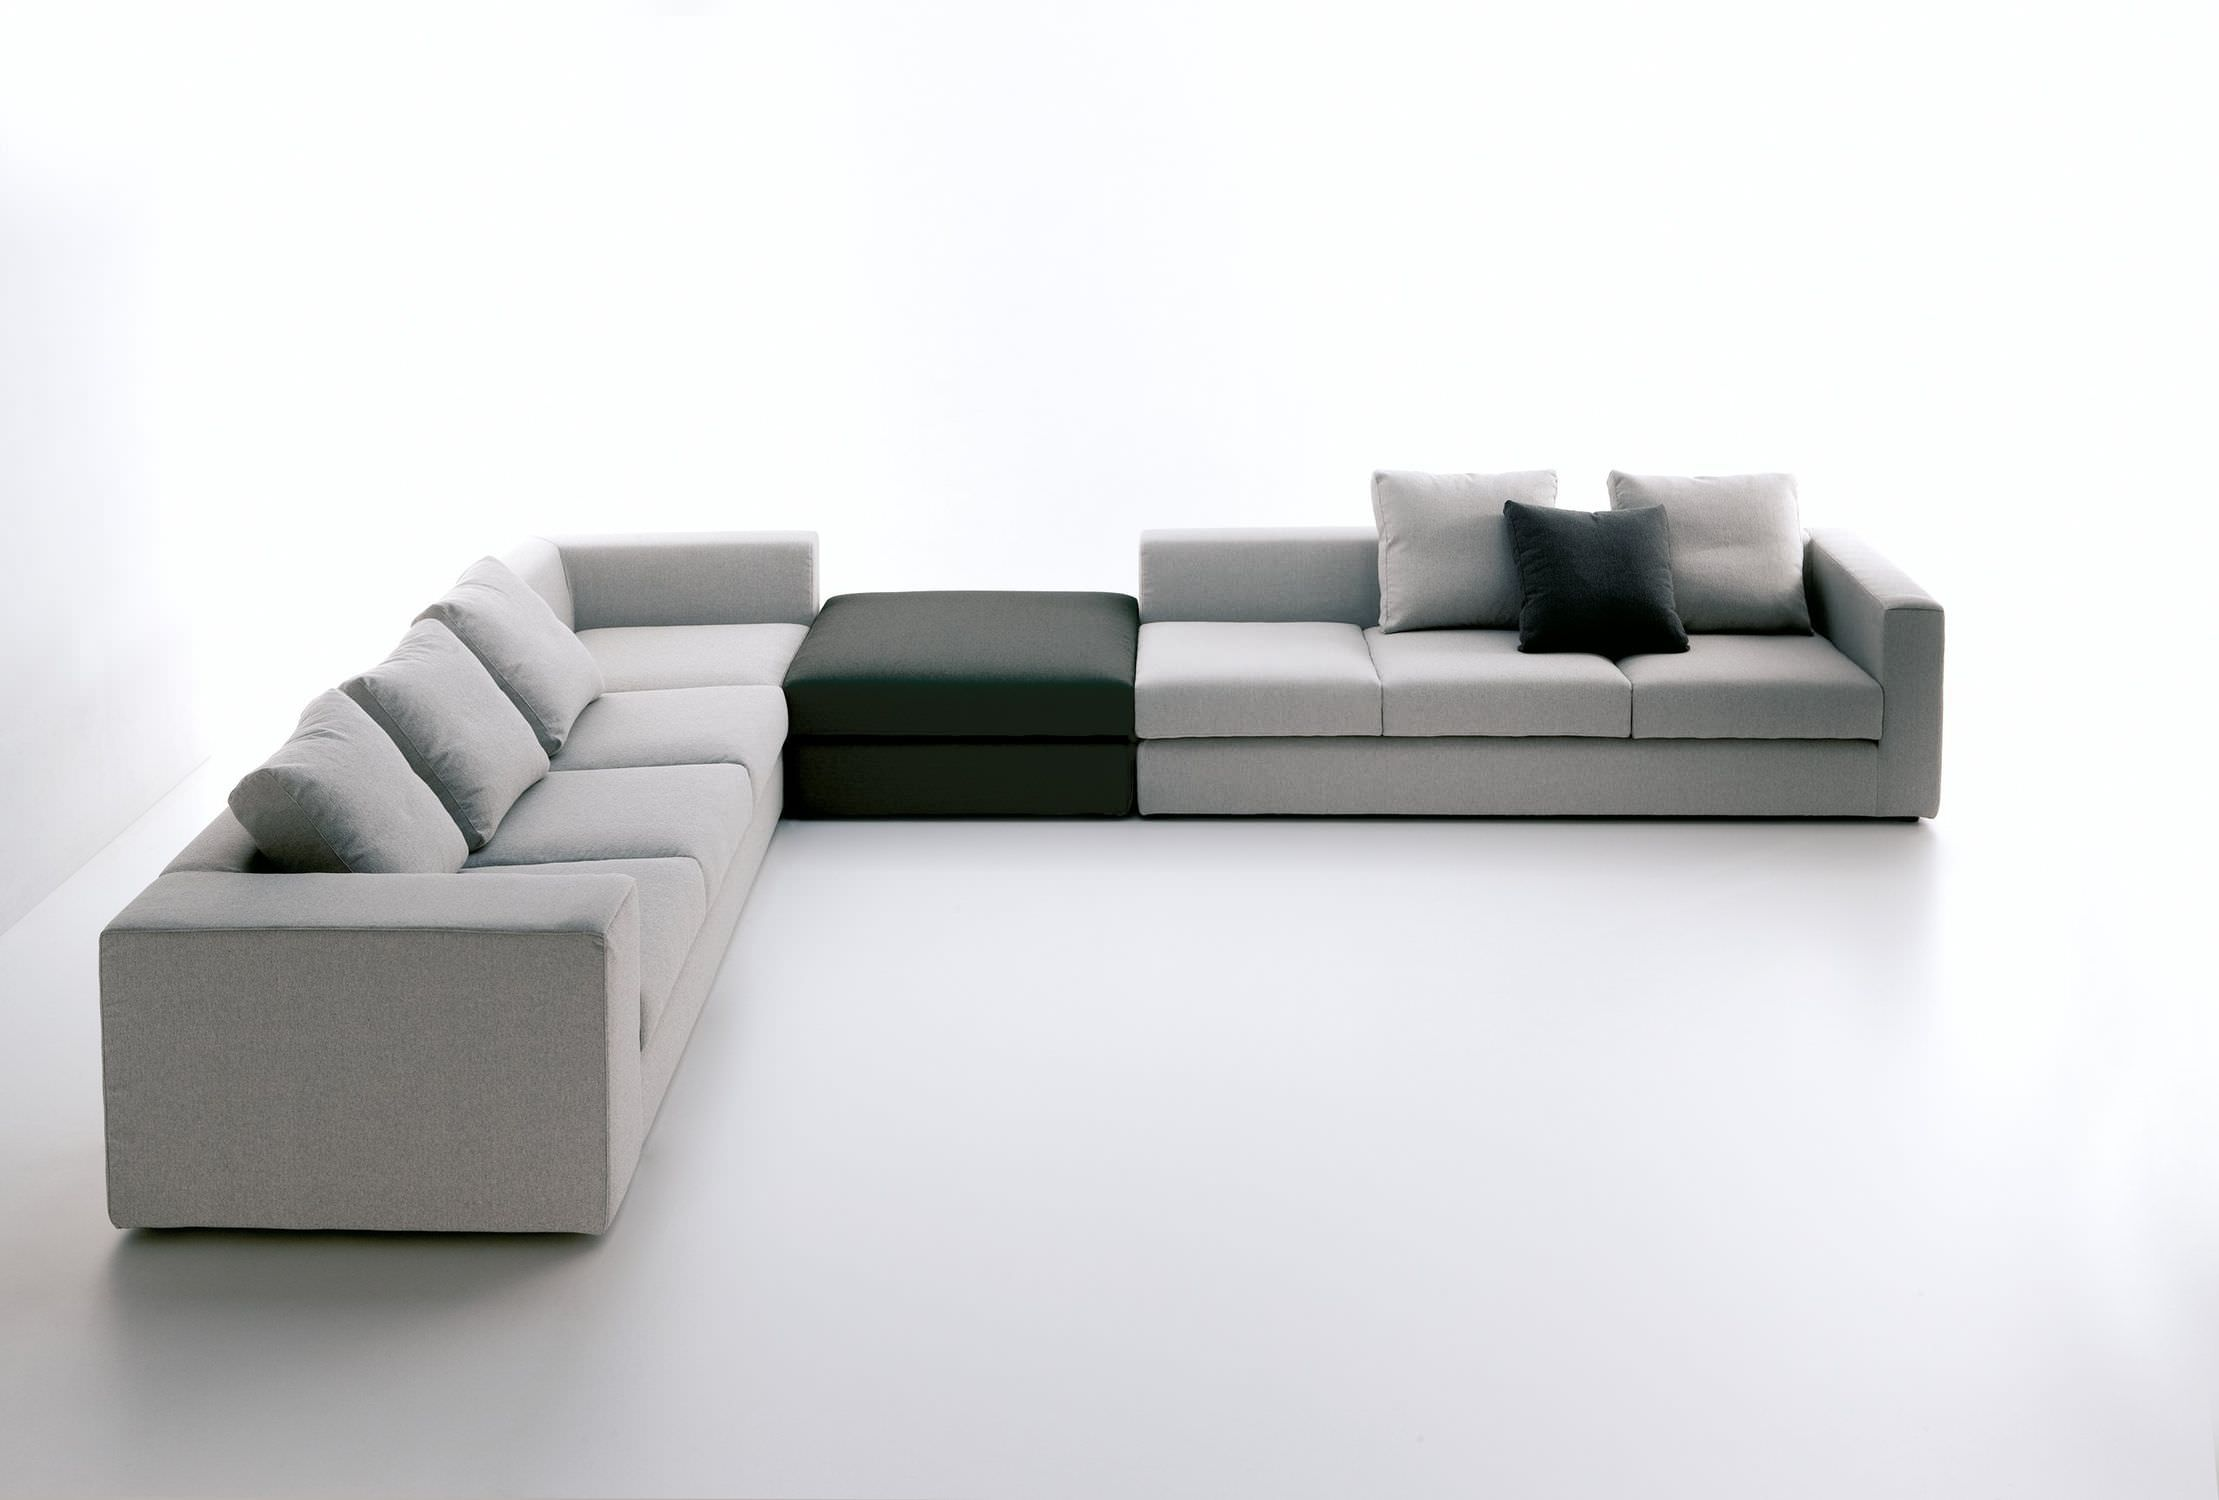 Interesting Sofa Designs To Bring The Tranquility Of Yoga To Your Modern Space Sofa Design Contemporary Modern Sofas Modular Sofa